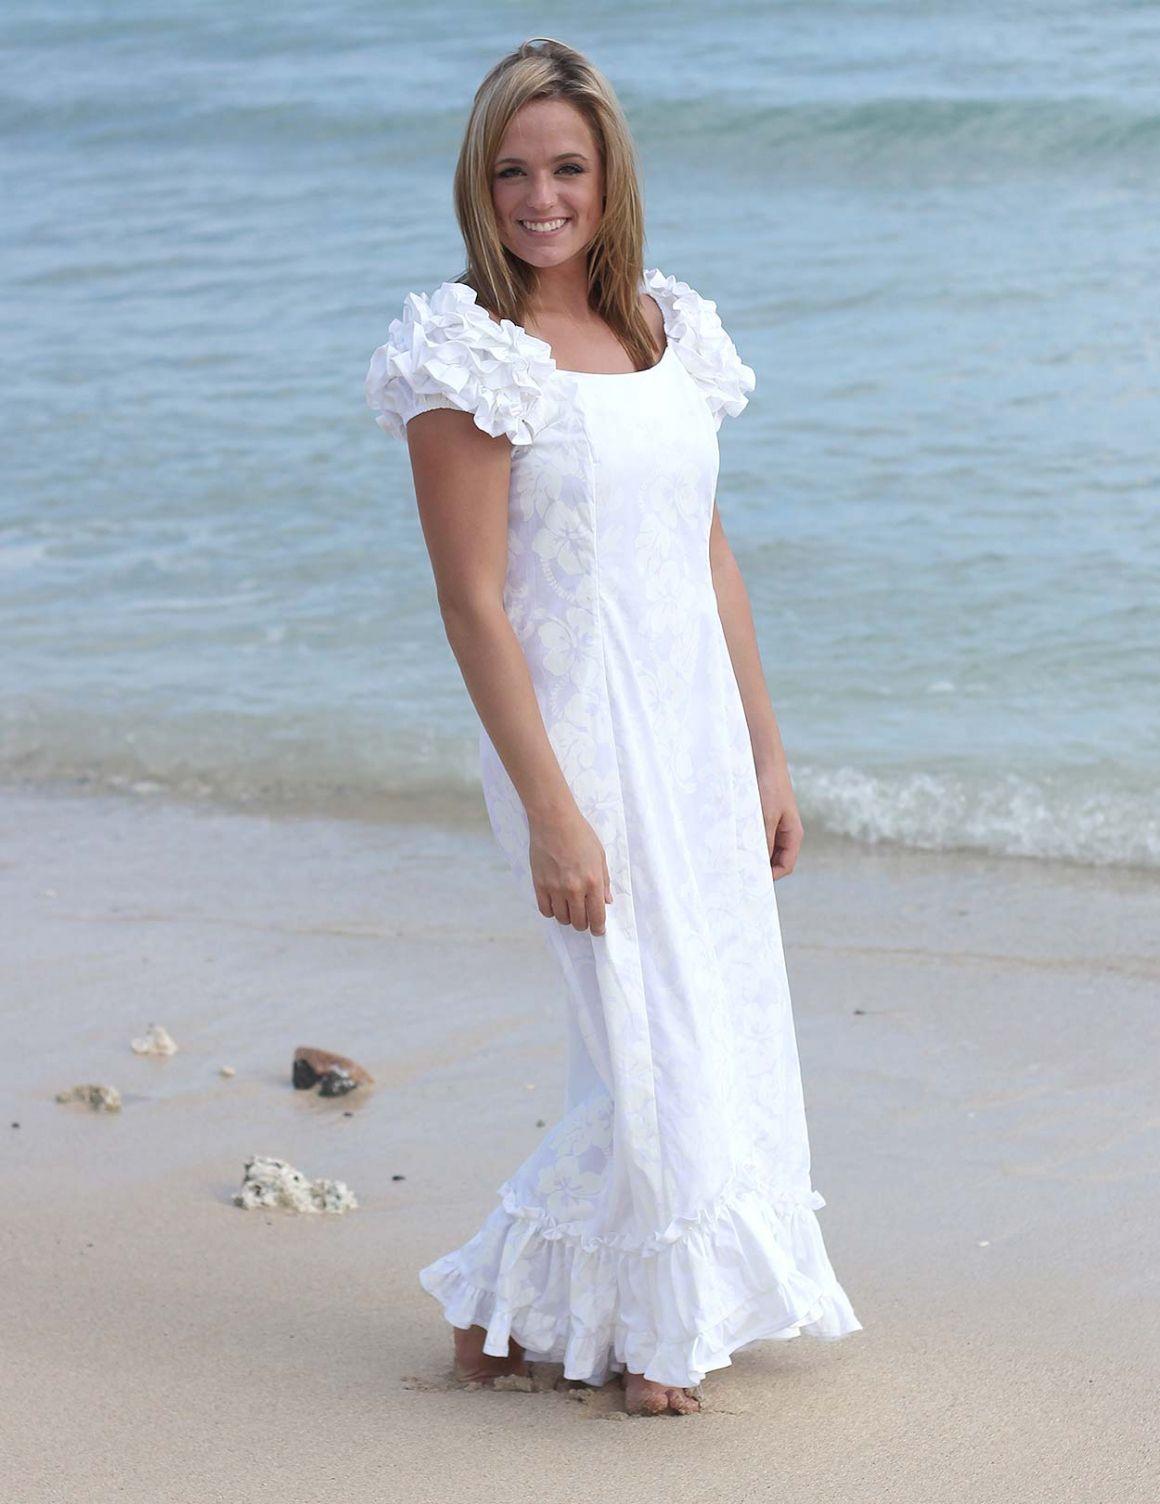 Hawaiian Wedding Dresses Plus Size Best Dresses For Wedding Check More At Http Svesty Com Hawaii Hawaiian Dress Hawaiian Wedding Dress White Hawaiian Dress [ 1504 x 1160 Pixel ]